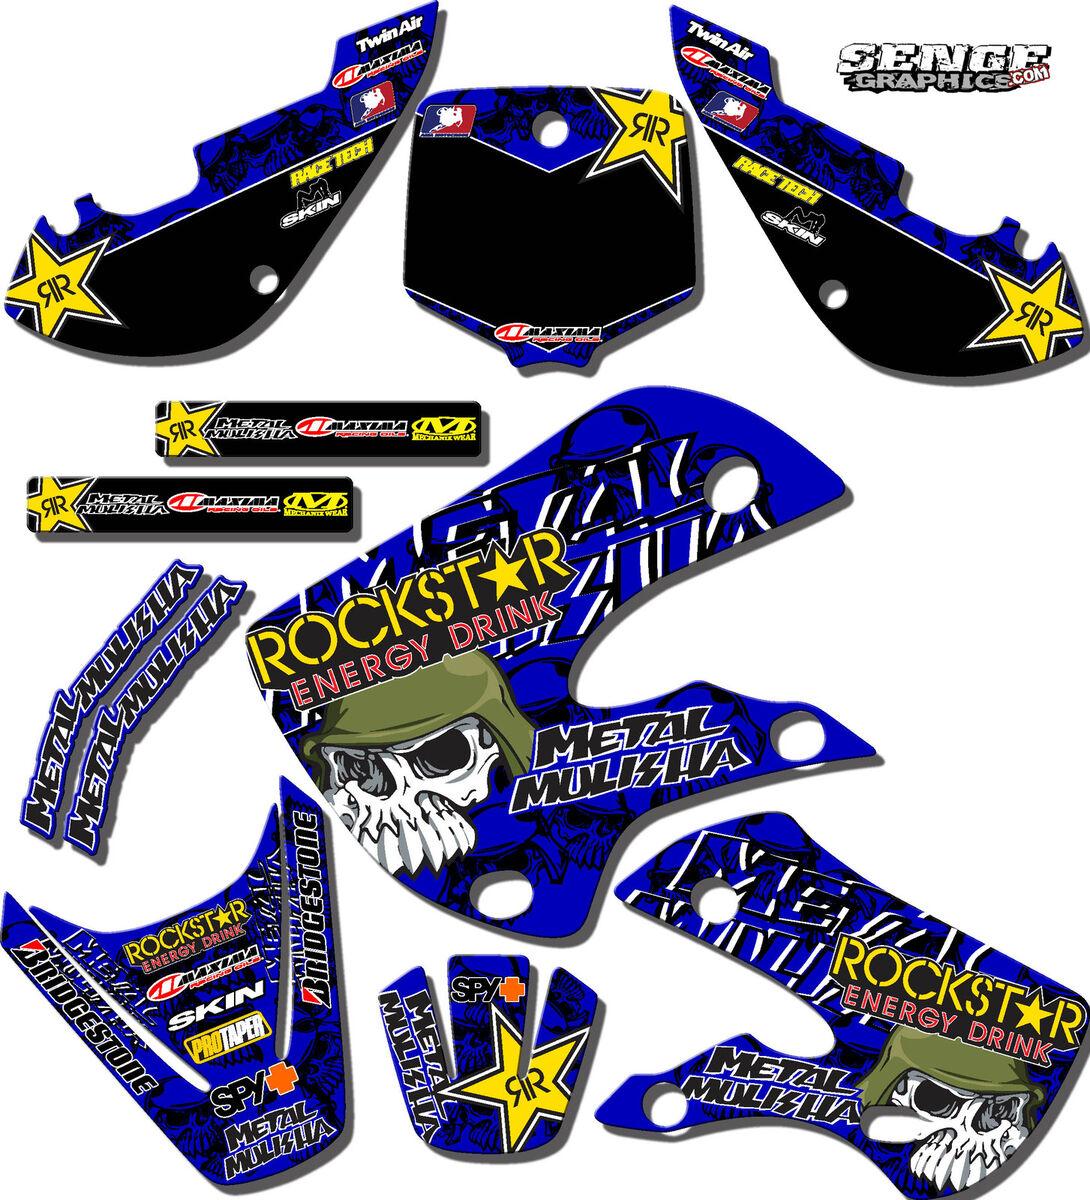 1997 1998 1999 2000 2001 yz 80 graphics kit yamaha yz80 deco car interior design